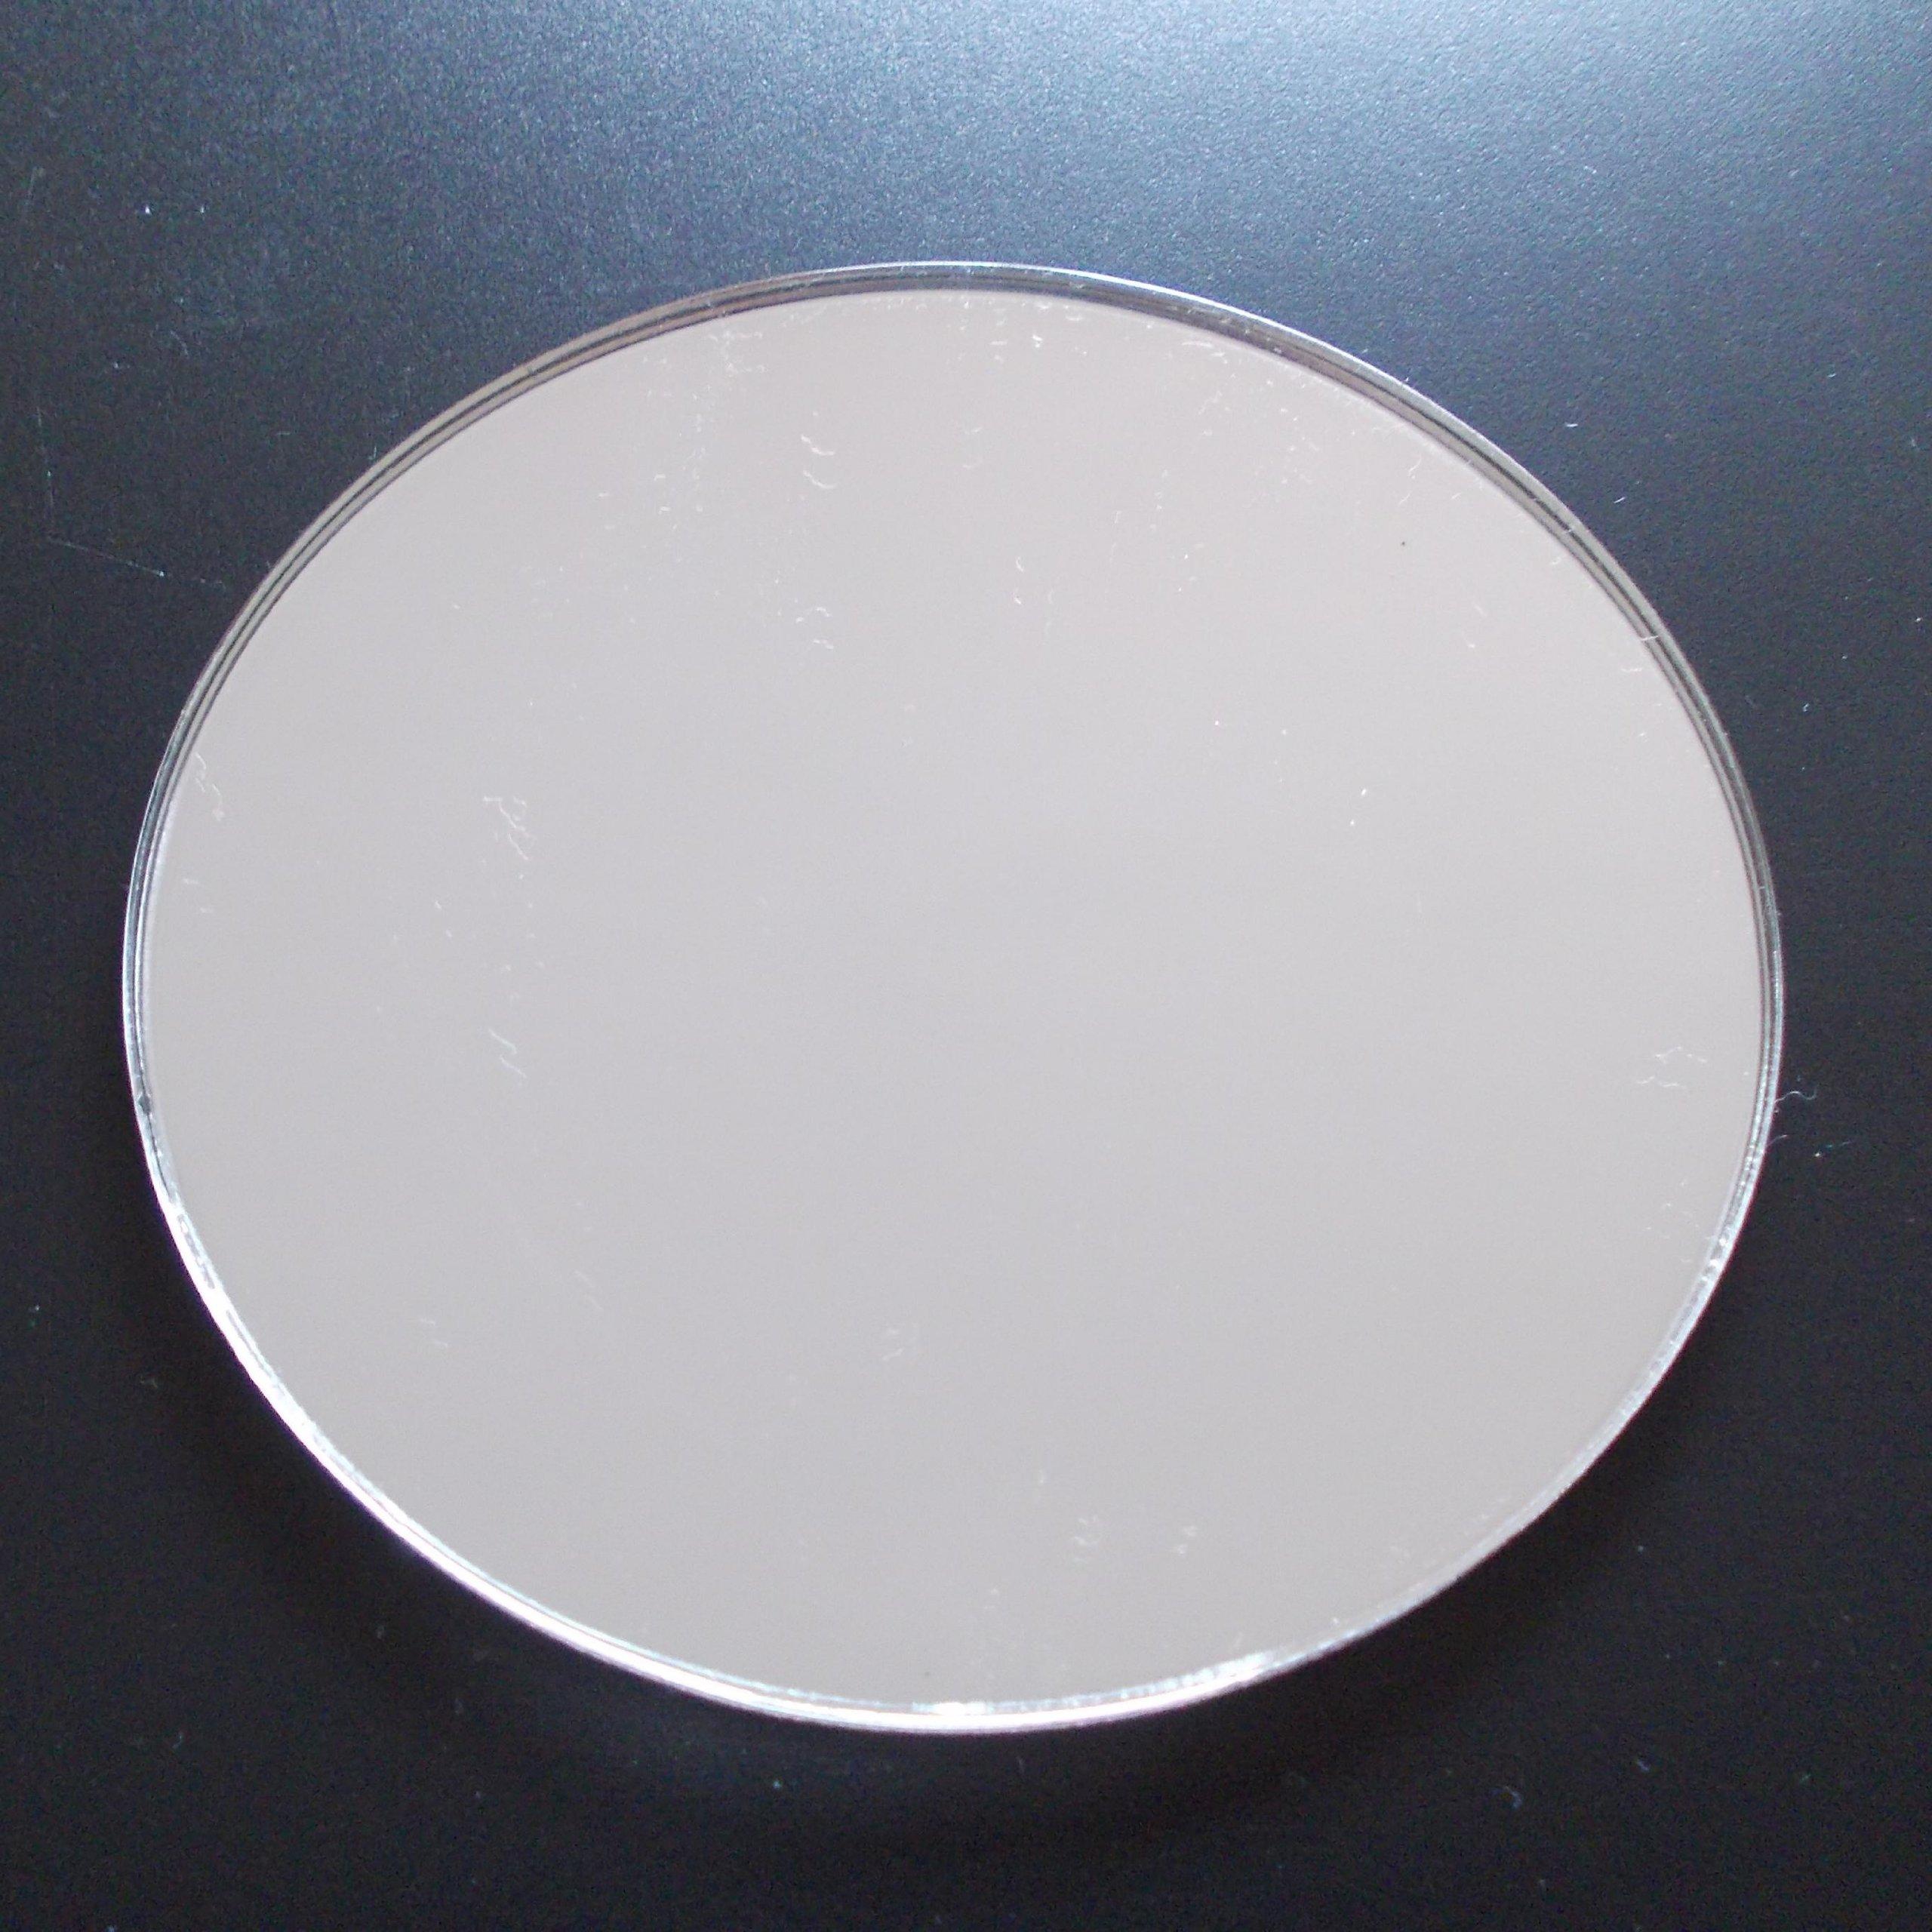 Round Circular Mirror Disc 25 SIZES TO CHOOSE   Silver Circular Acrylic  Mirror Round Wall Safety